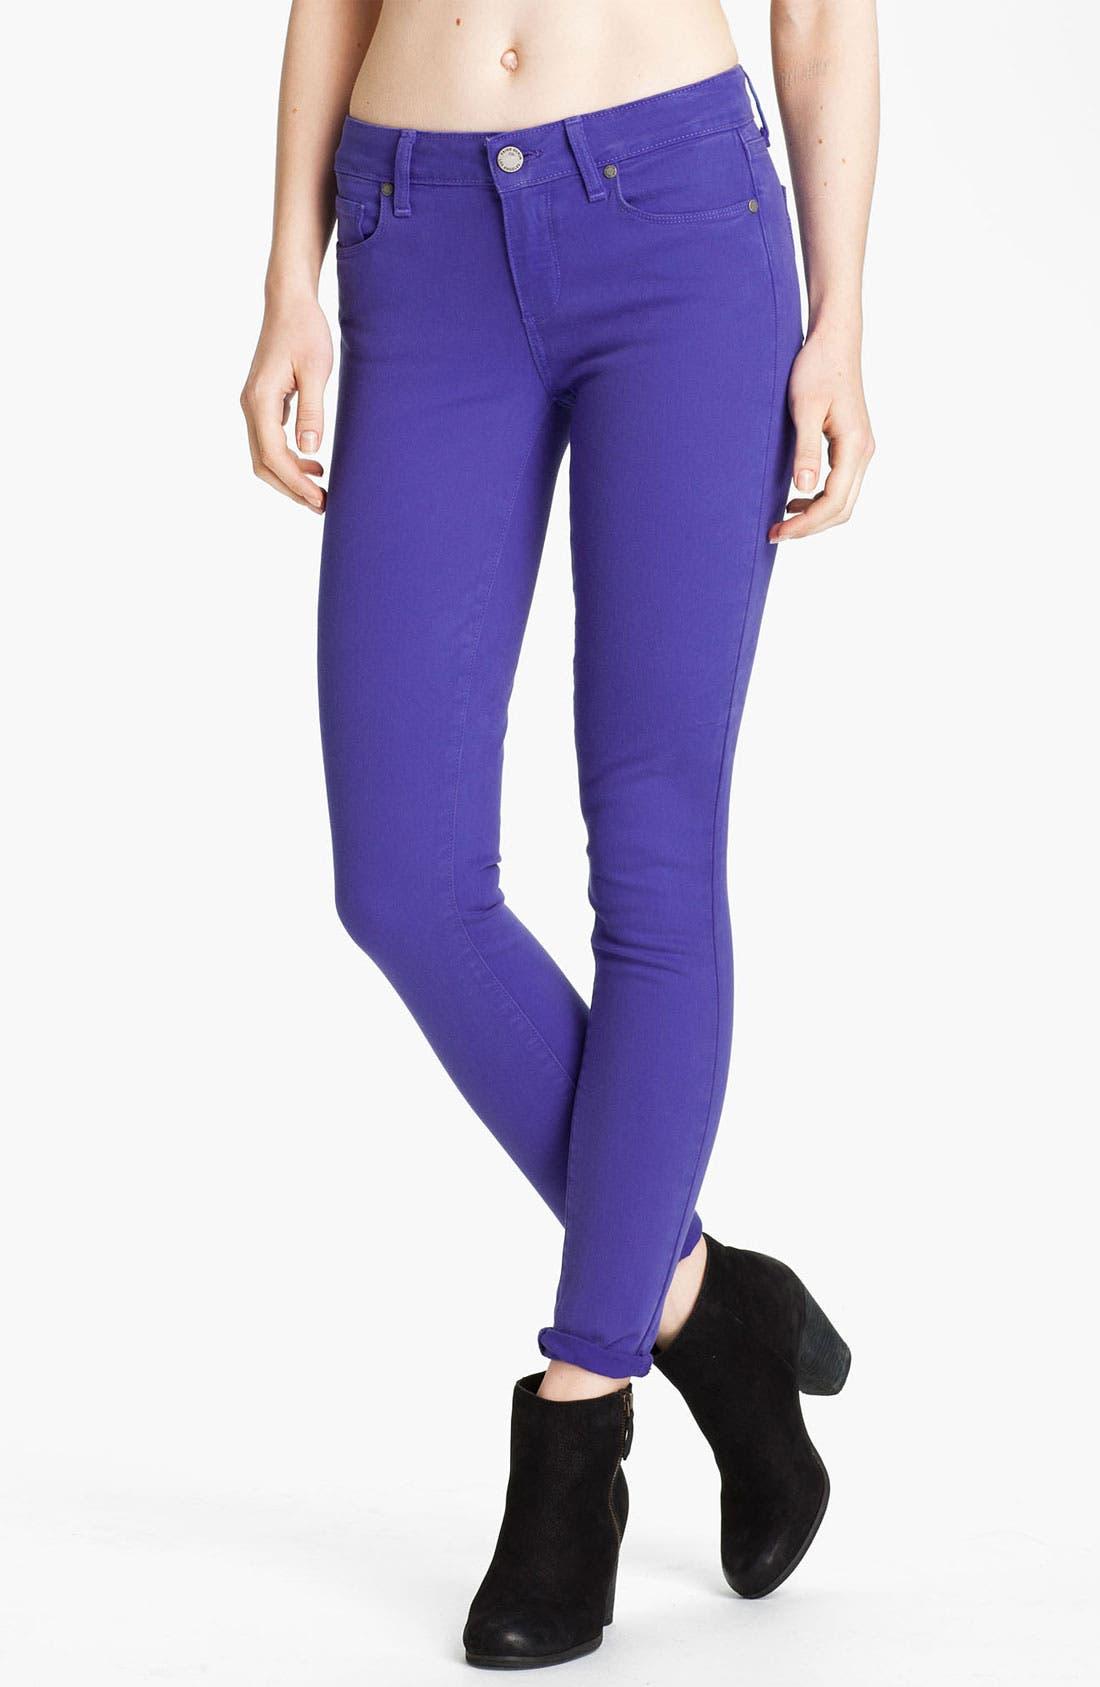 Main Image - Paige Denim 'Verdugo' Skinny Stretch Denim Jeans (Violet Blue)